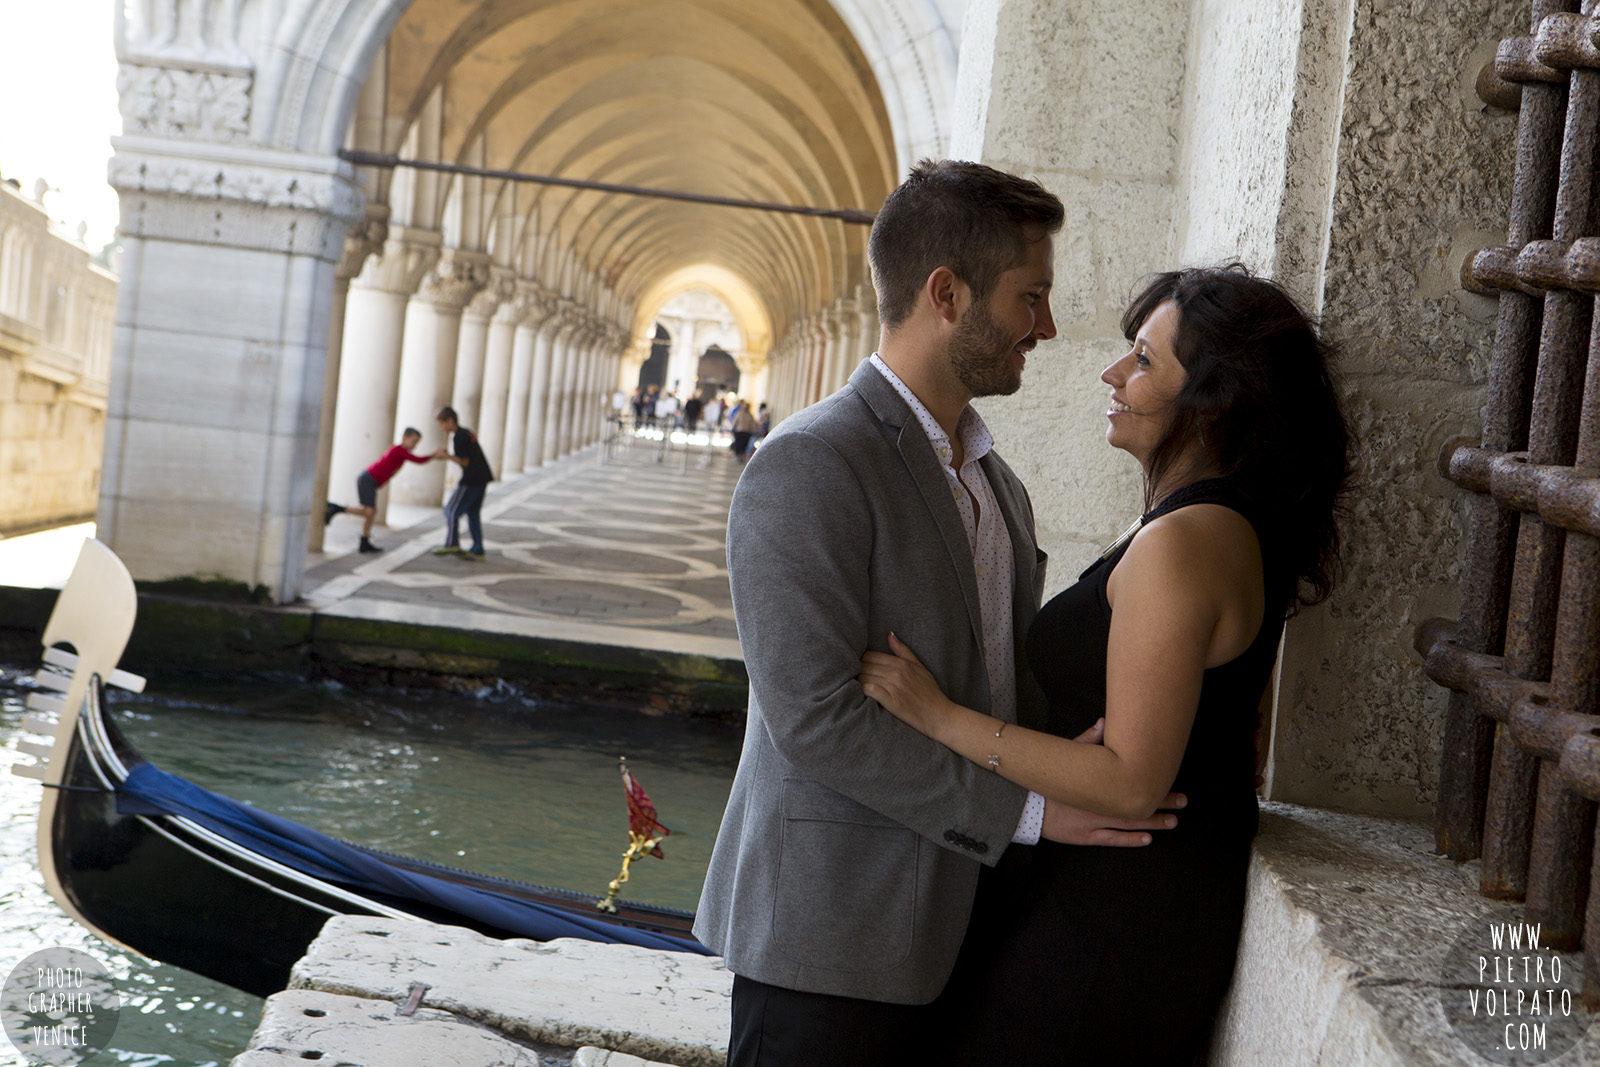 photographer-venice-photoshoot-couple-romantic-vacation-20160417_03